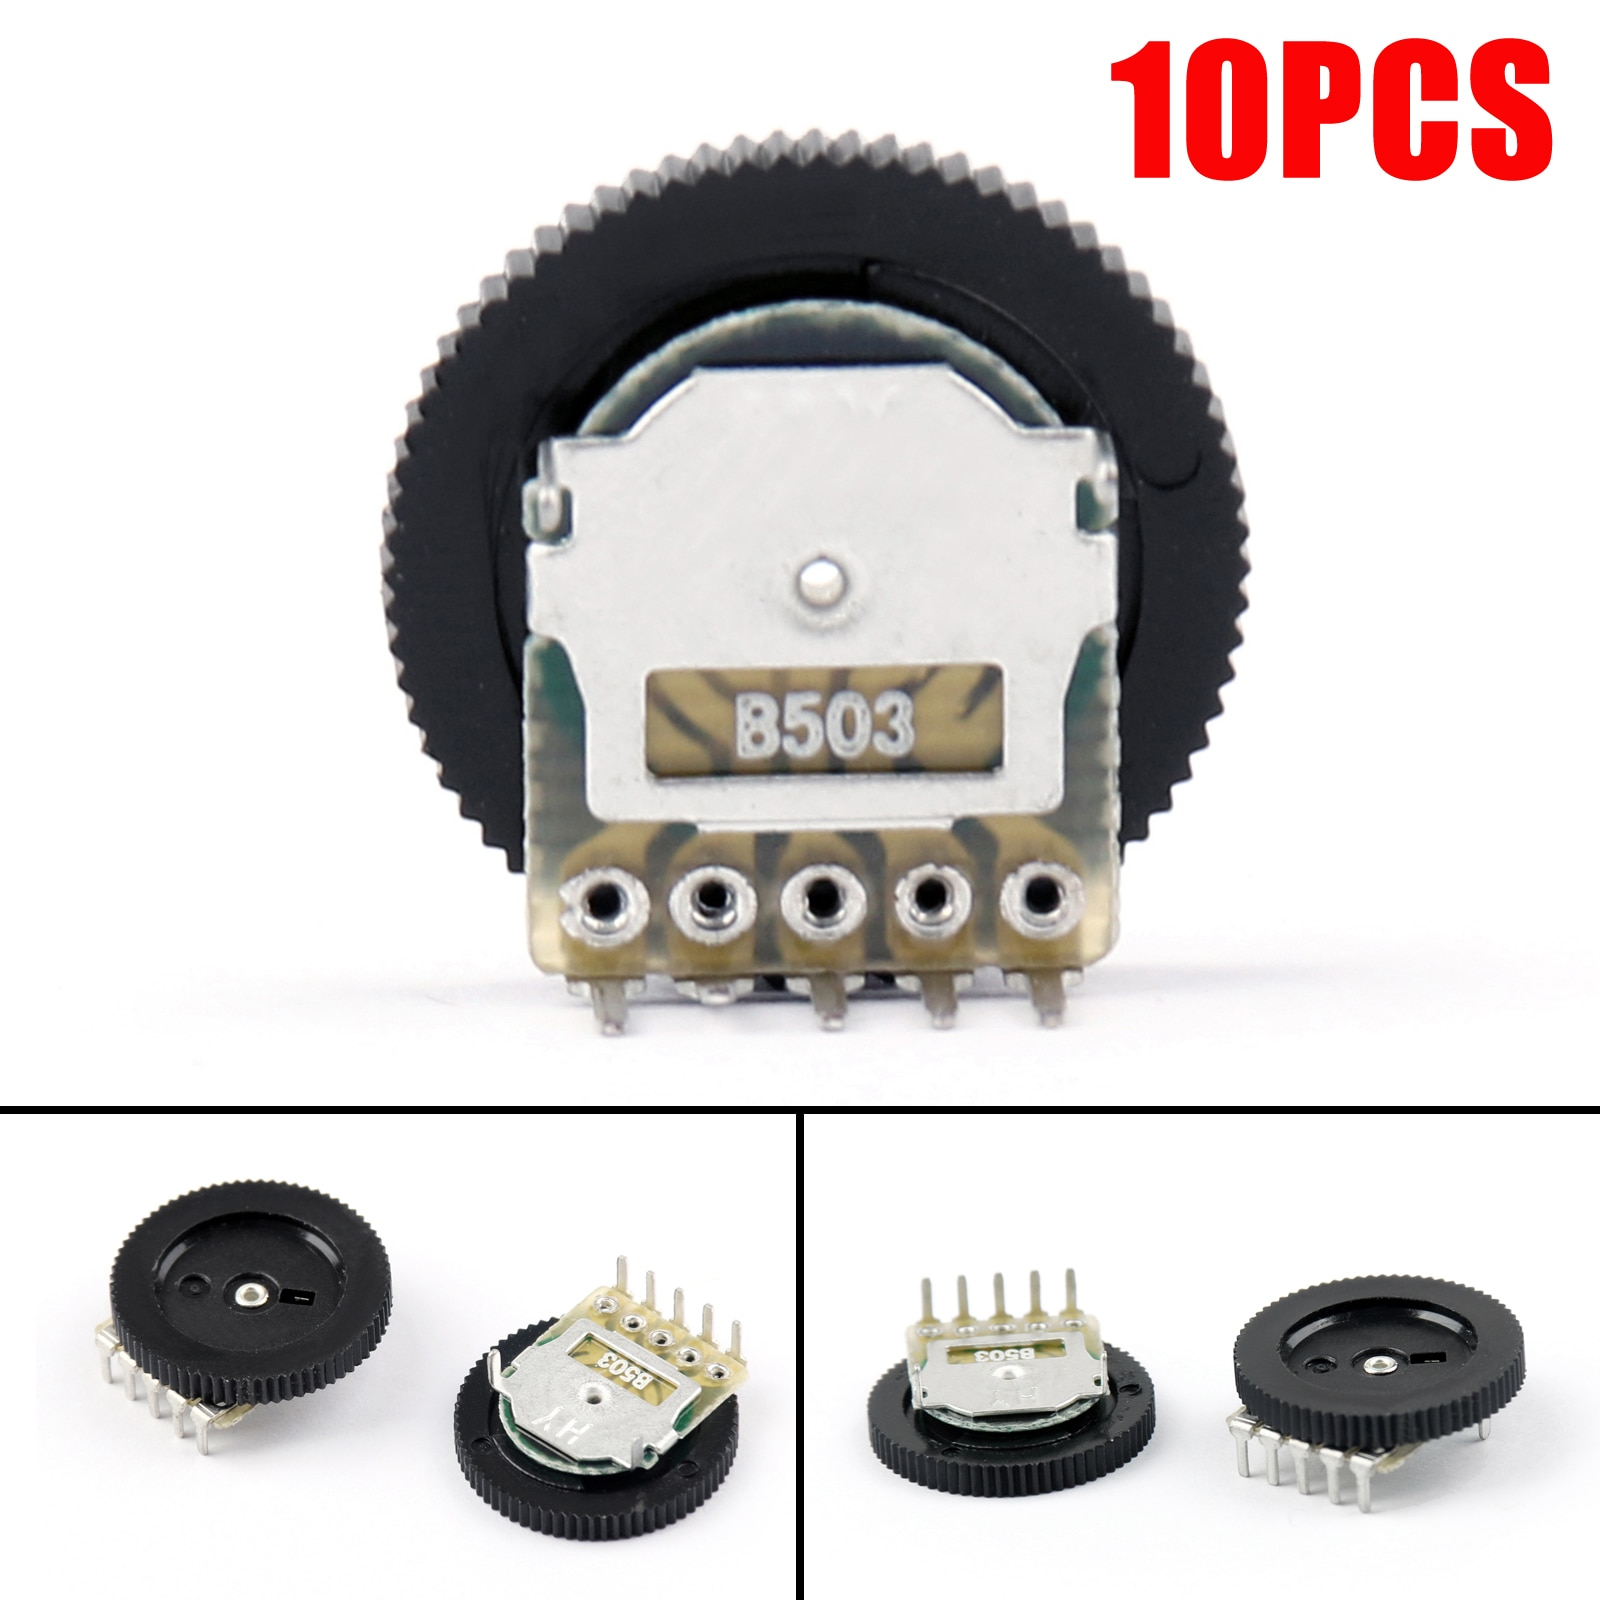 10 pces 16x2mm 50 k ohm duplo dial atarraxamento volume roda duplex b503 potenciômetro